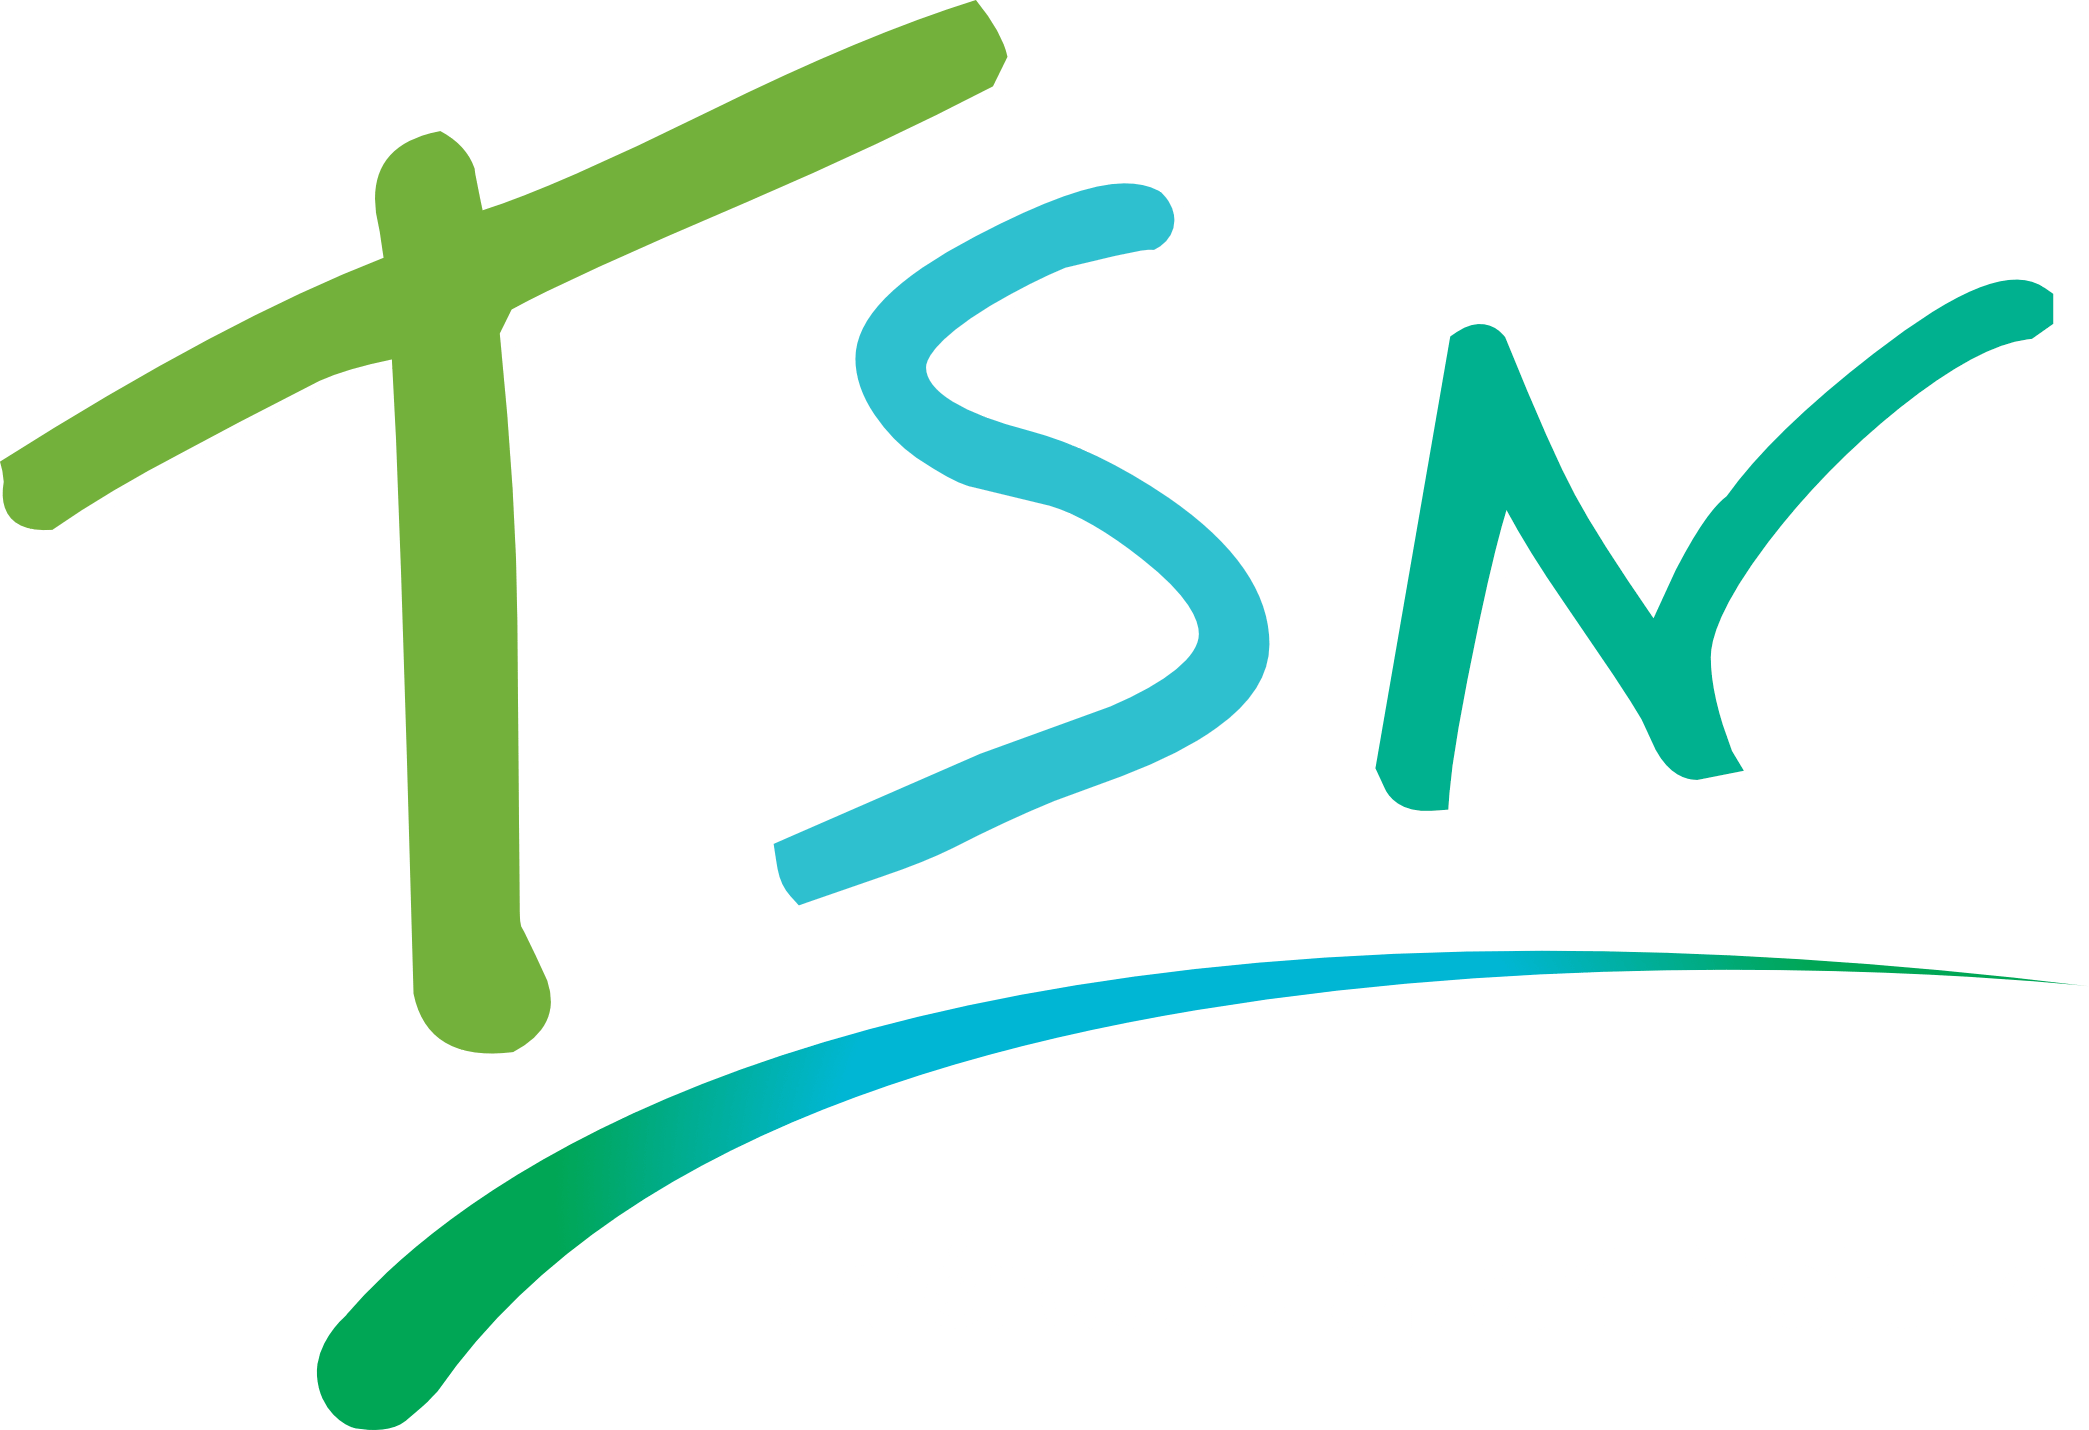 Thiérache Sport Nature